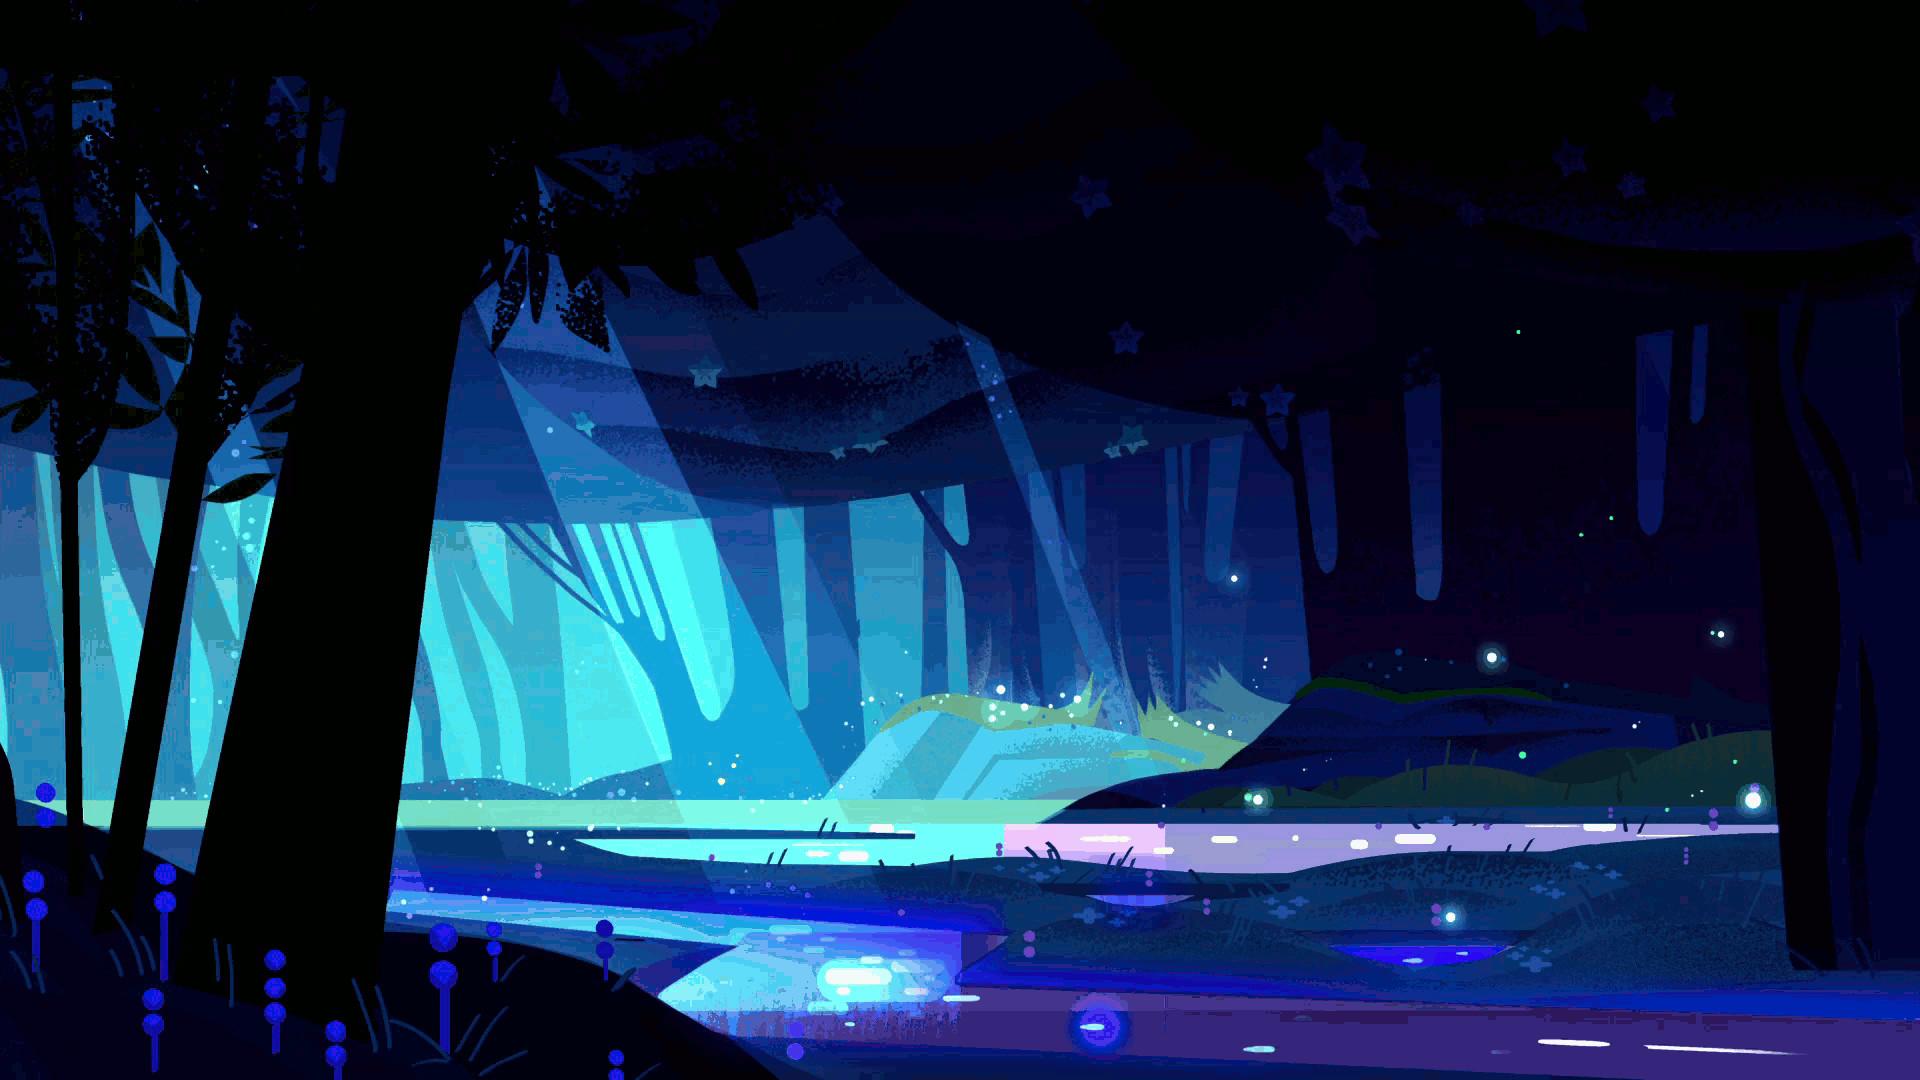 Steven Universe Desktop Wallpaper (74+ images)